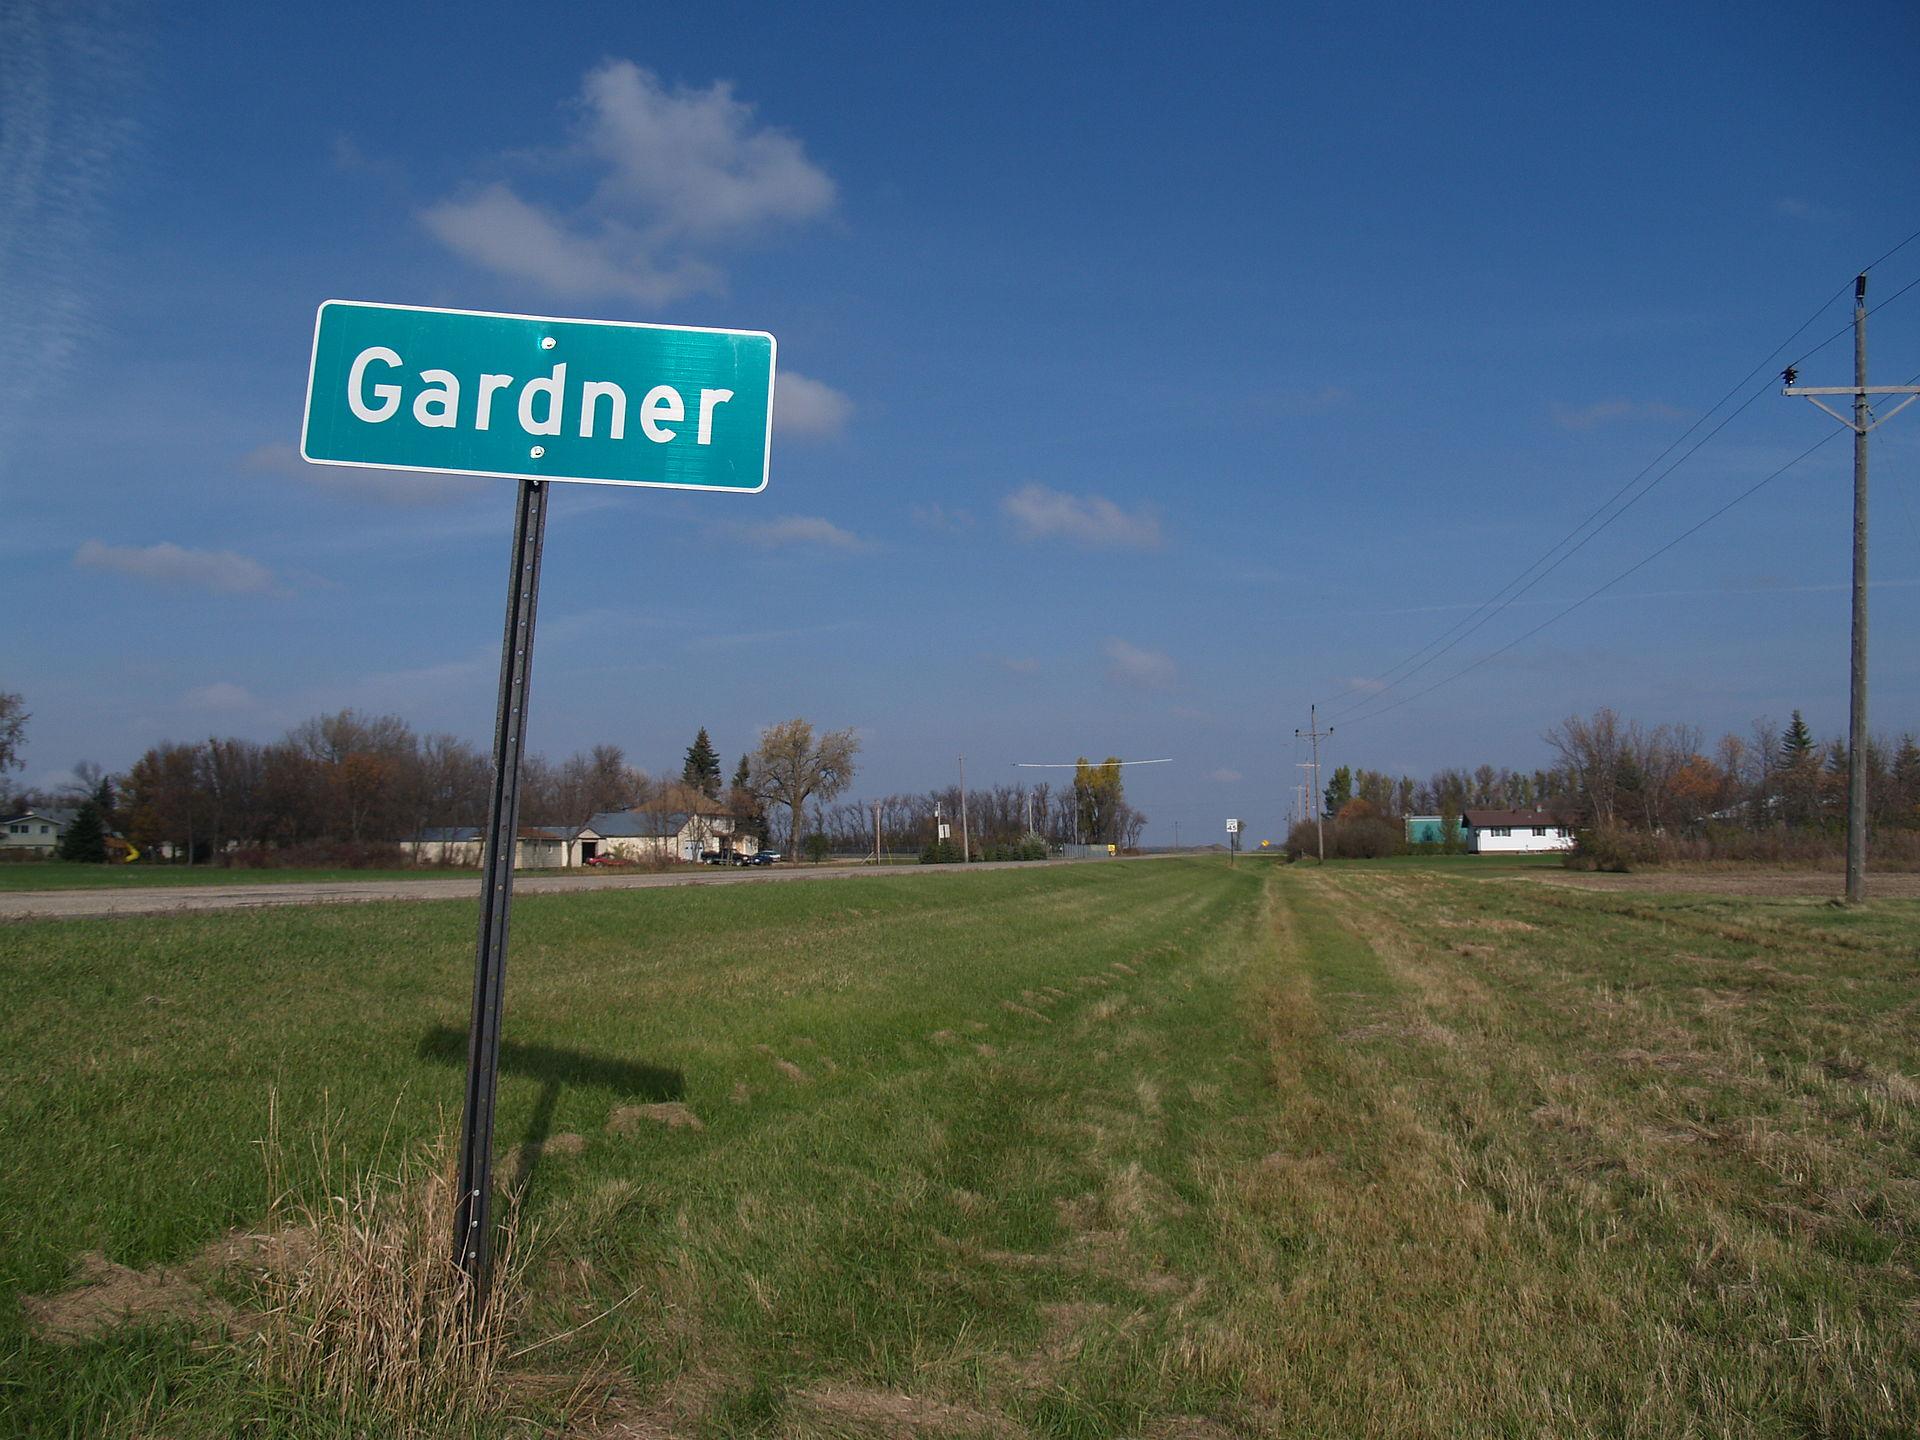 Personals in gardner north dakota